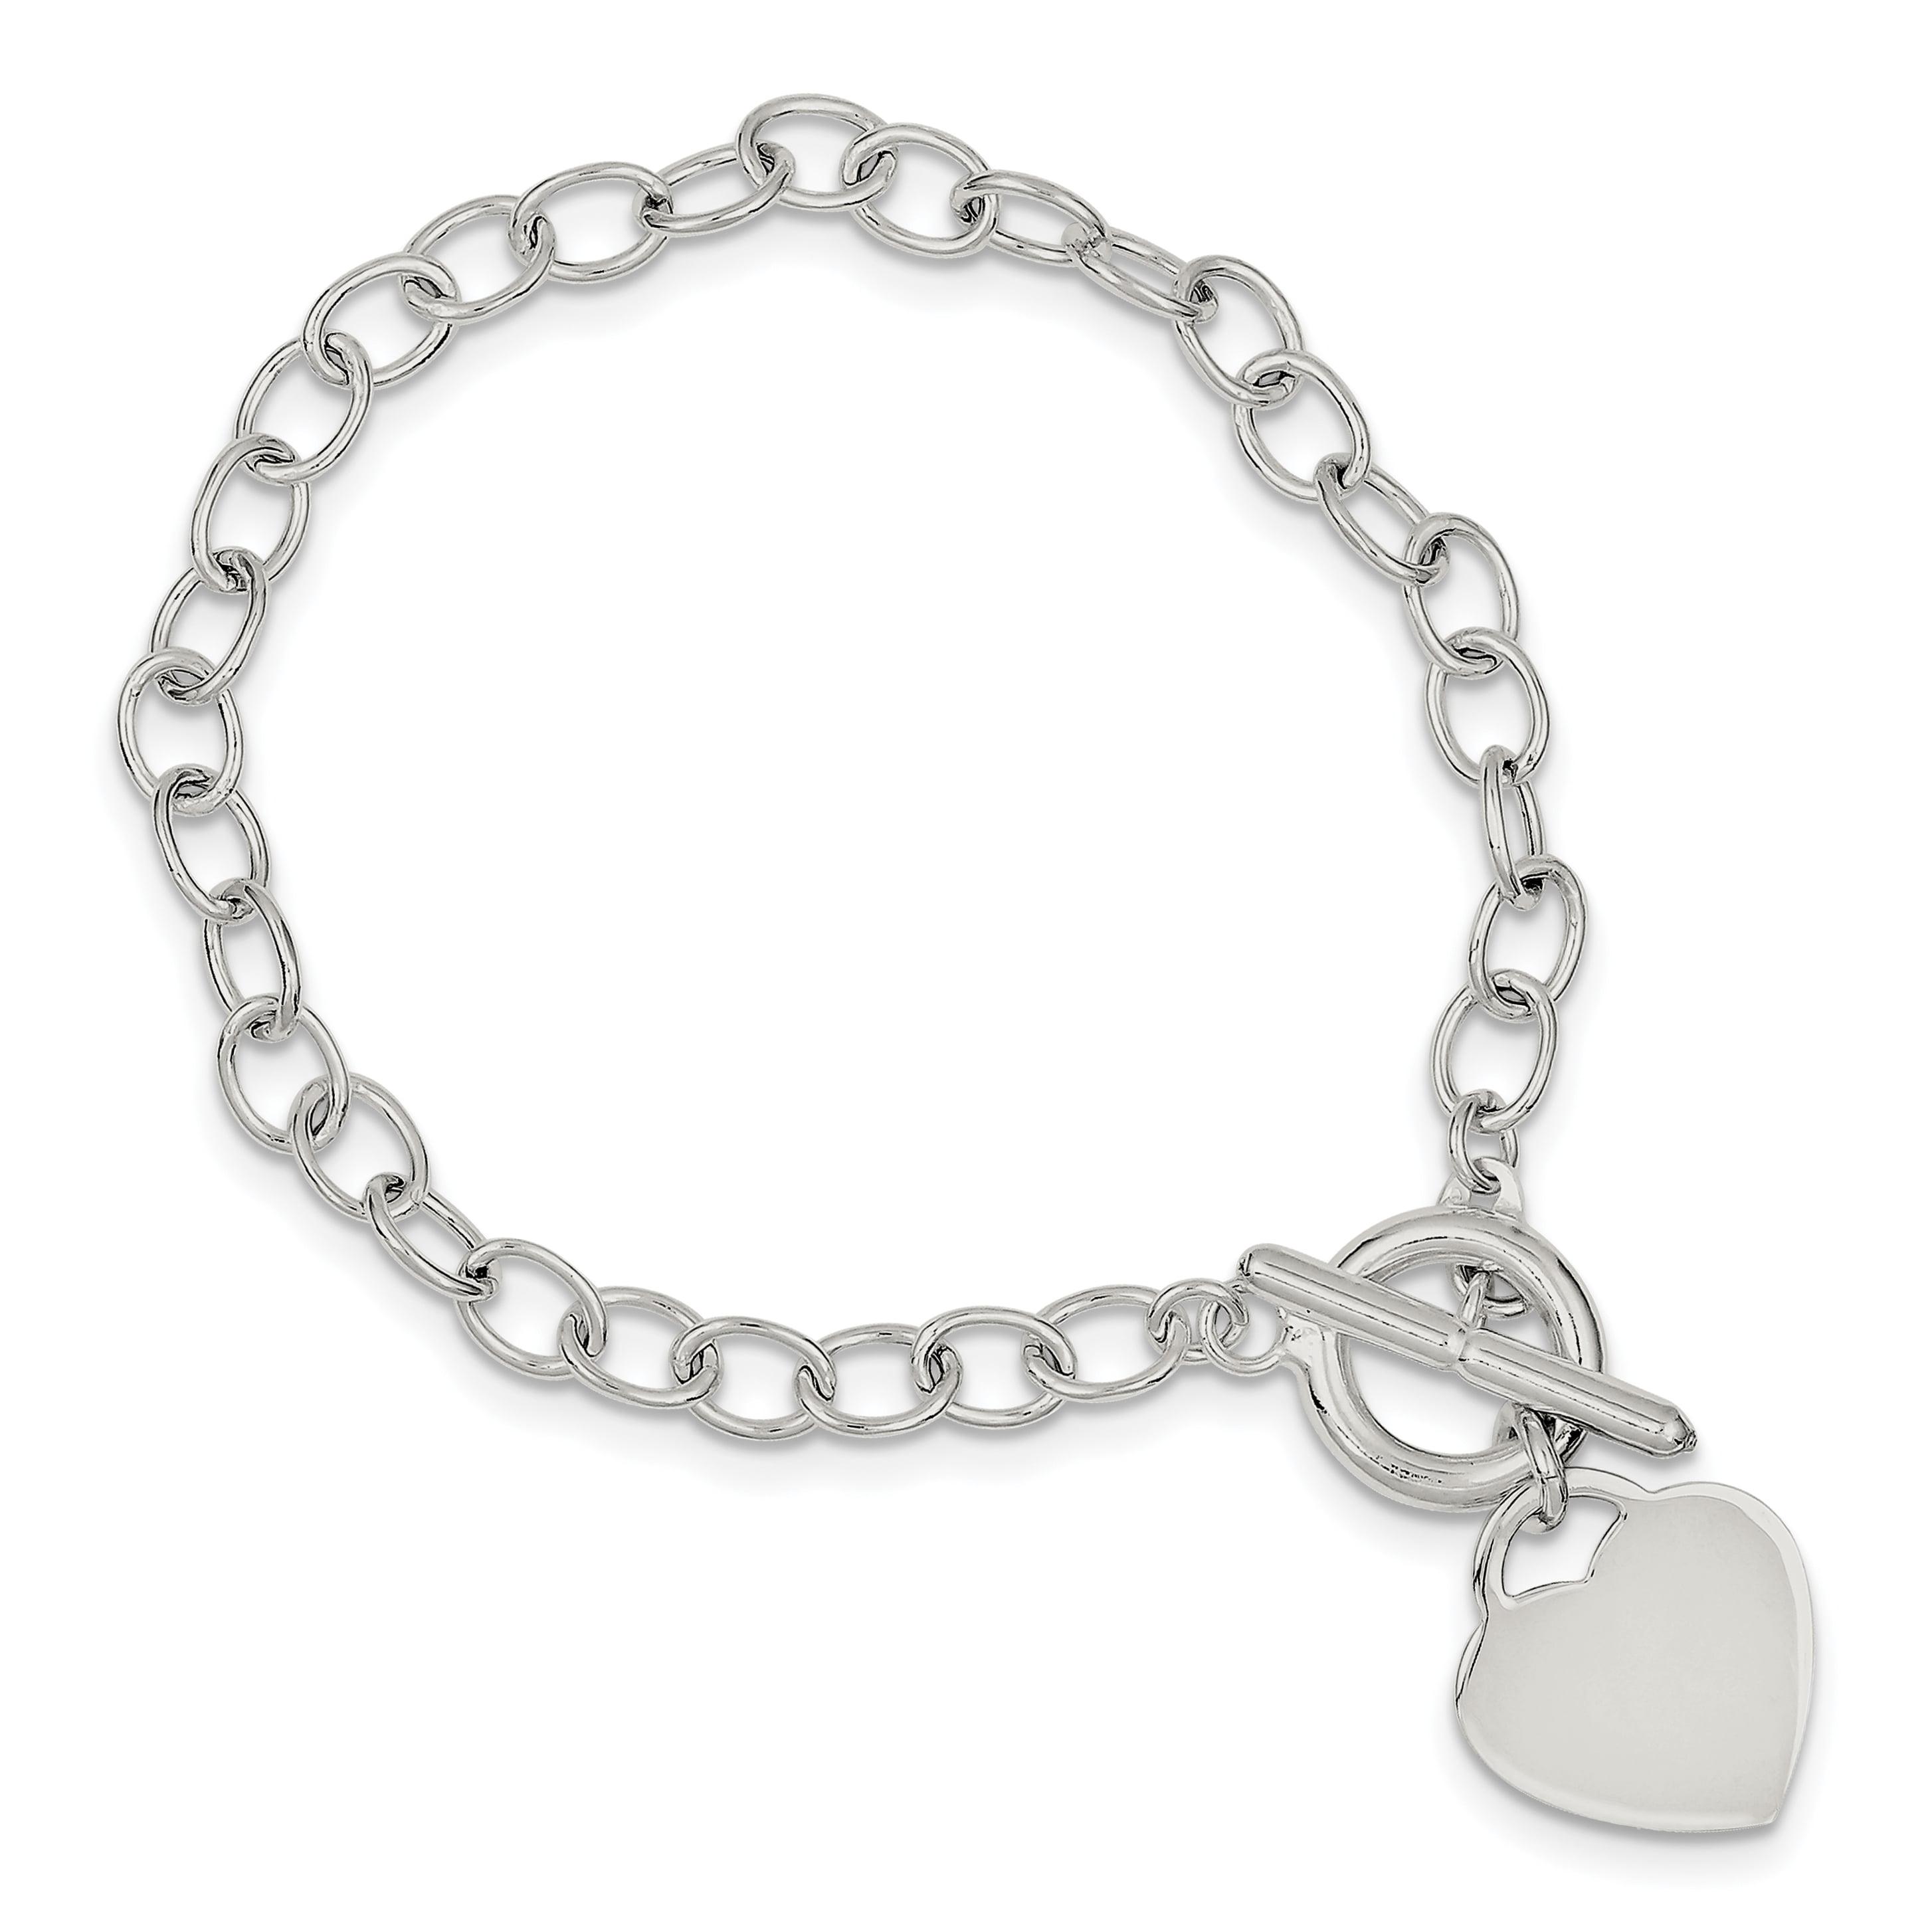 925 Sterling Silver Oval Link Heart Bracelet 7.5 Inch /love Fine Jewelry Gifts For Women For Her - image 3 de 3